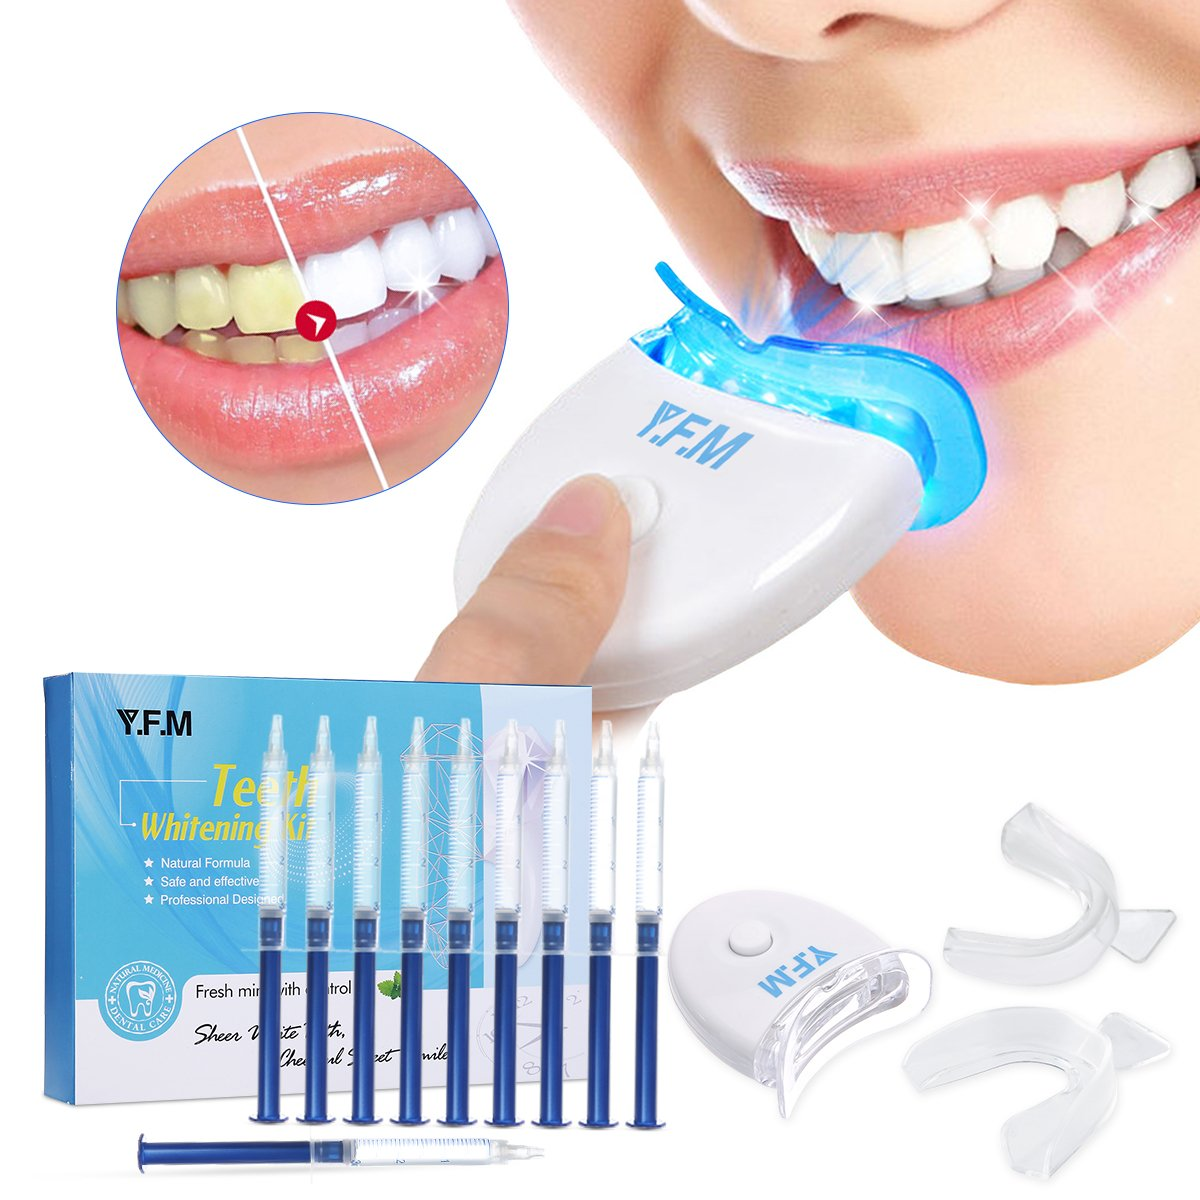 Teeth Whitening, Y.F.M Teeth Whitening Kit with LED Light, Natural Peroxide Gel, Professional Dental Whitener, Home Teeth Whitener System: 10 X 5ml Gel Syringes, Custom Trays - Fast Results